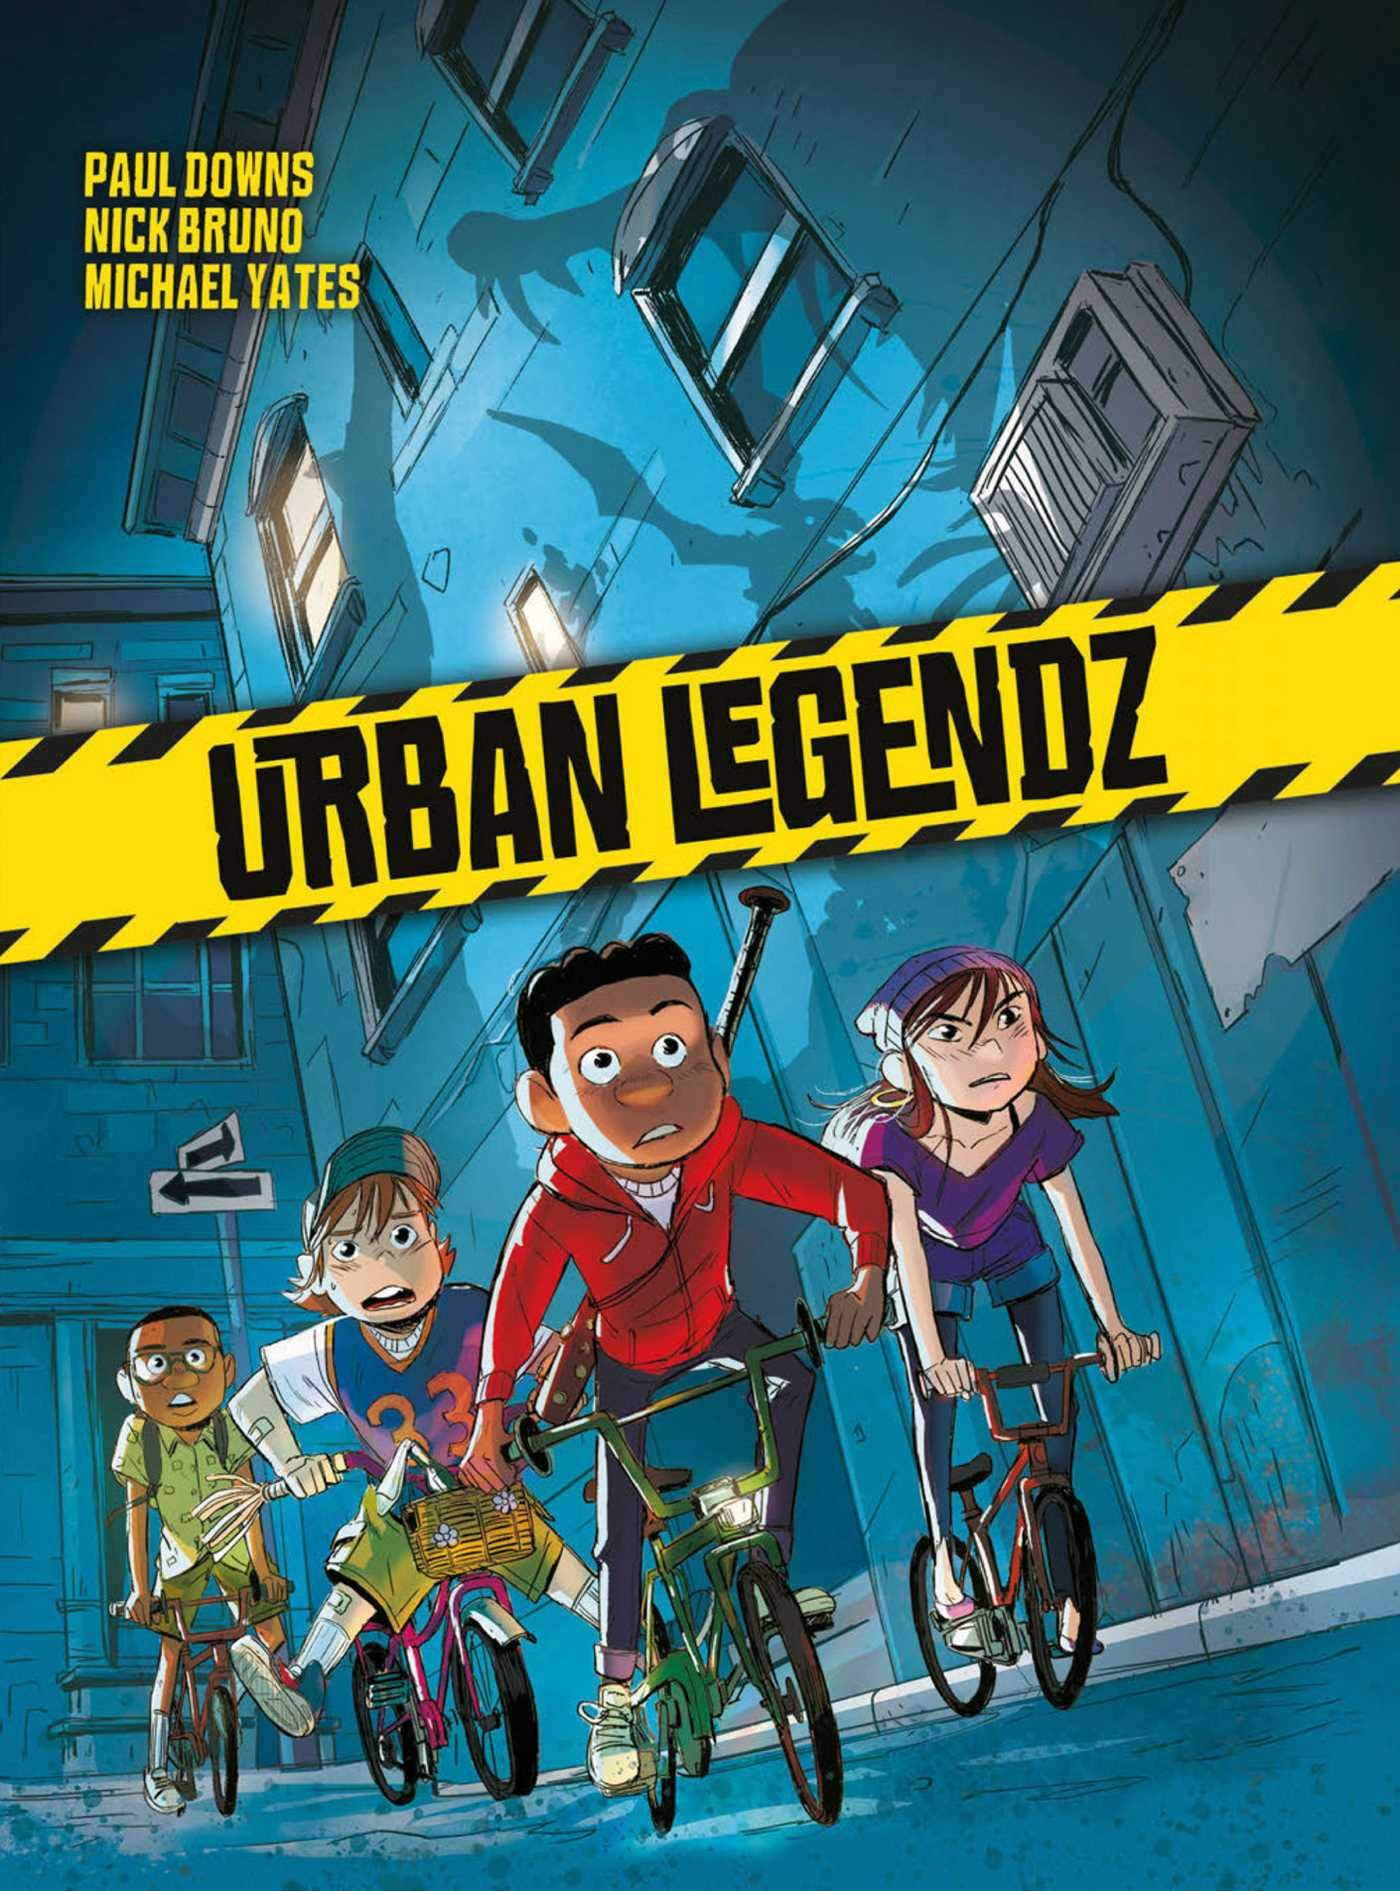 Amazon.com: Urban Legendz (9781594657146): Downs, Paul, Bruno, Nick, Yates,  Michael: Books